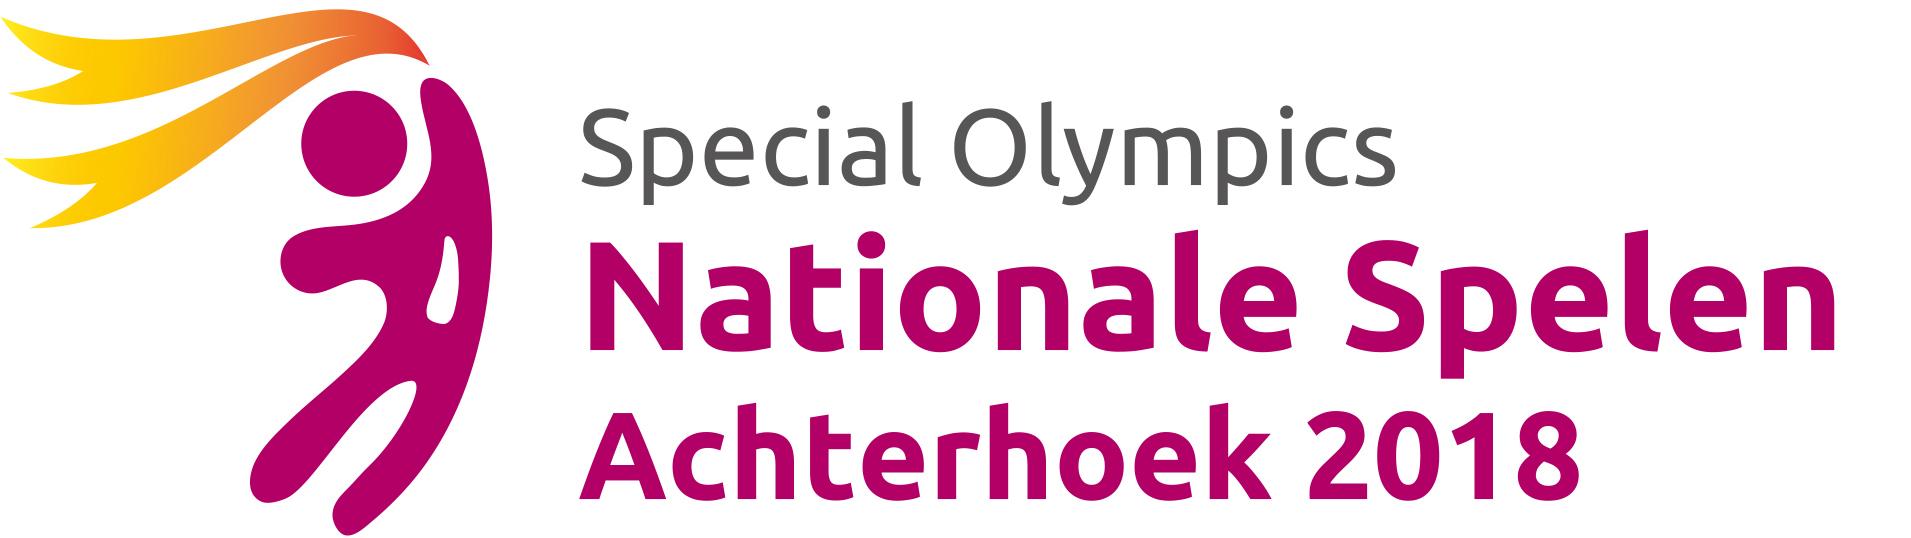 SONS (Special Olympics Nationale Spelen) @ SAZA Topsporthal Achterhoek | Doetinchem | Gelderland | Nederland